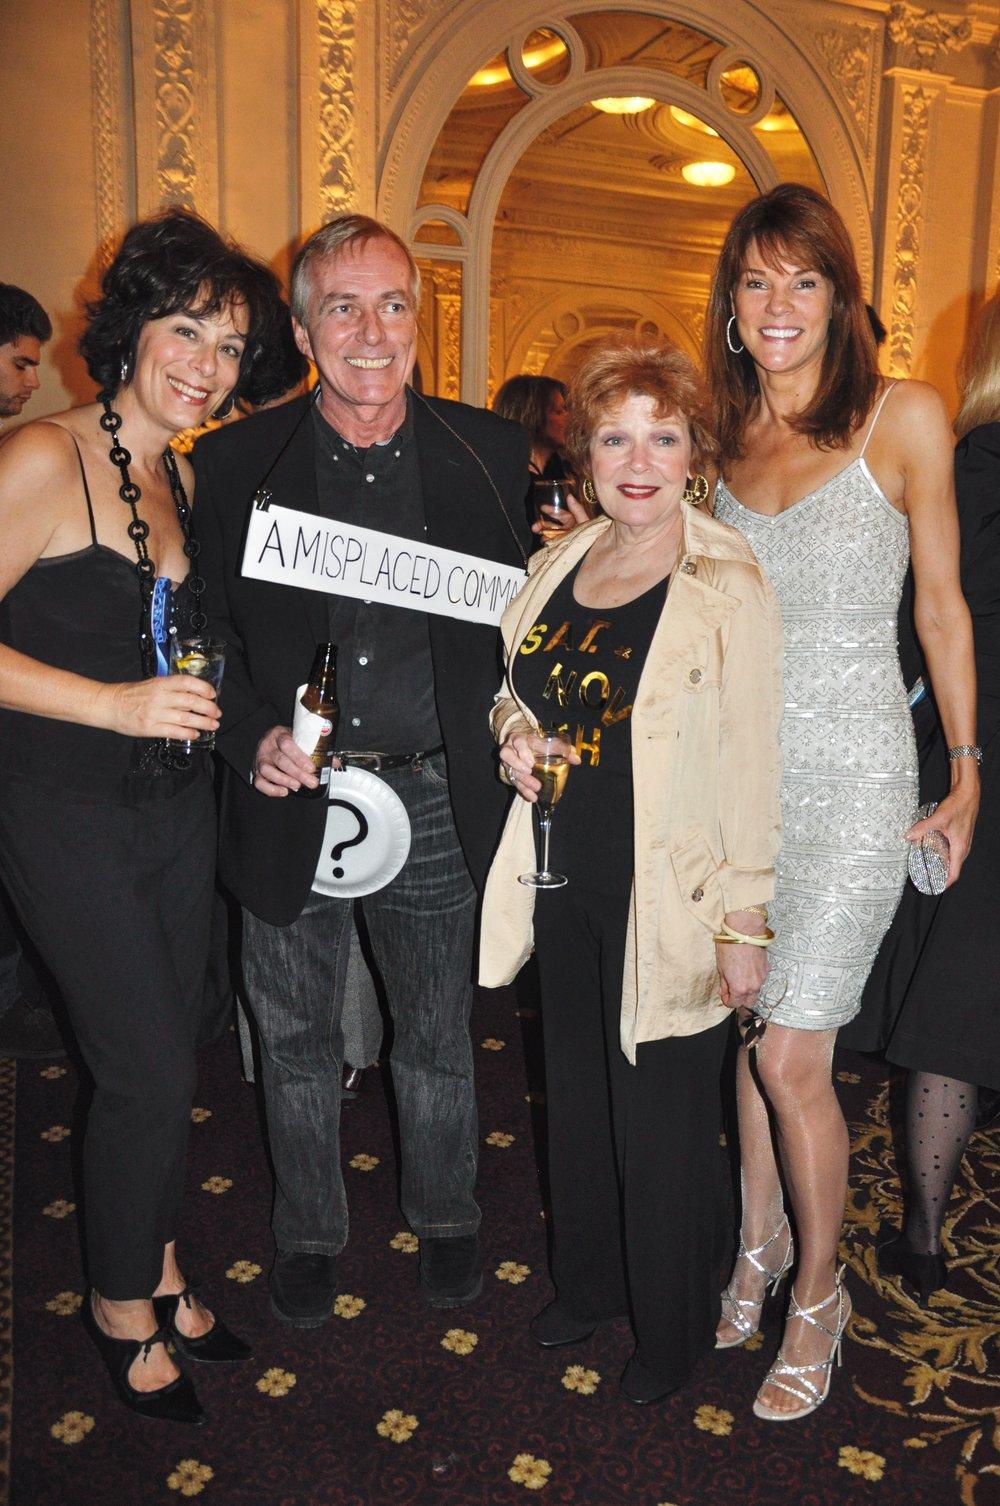 Jane Kaczmarek, Anita Gillette, and Carolyn McCormick